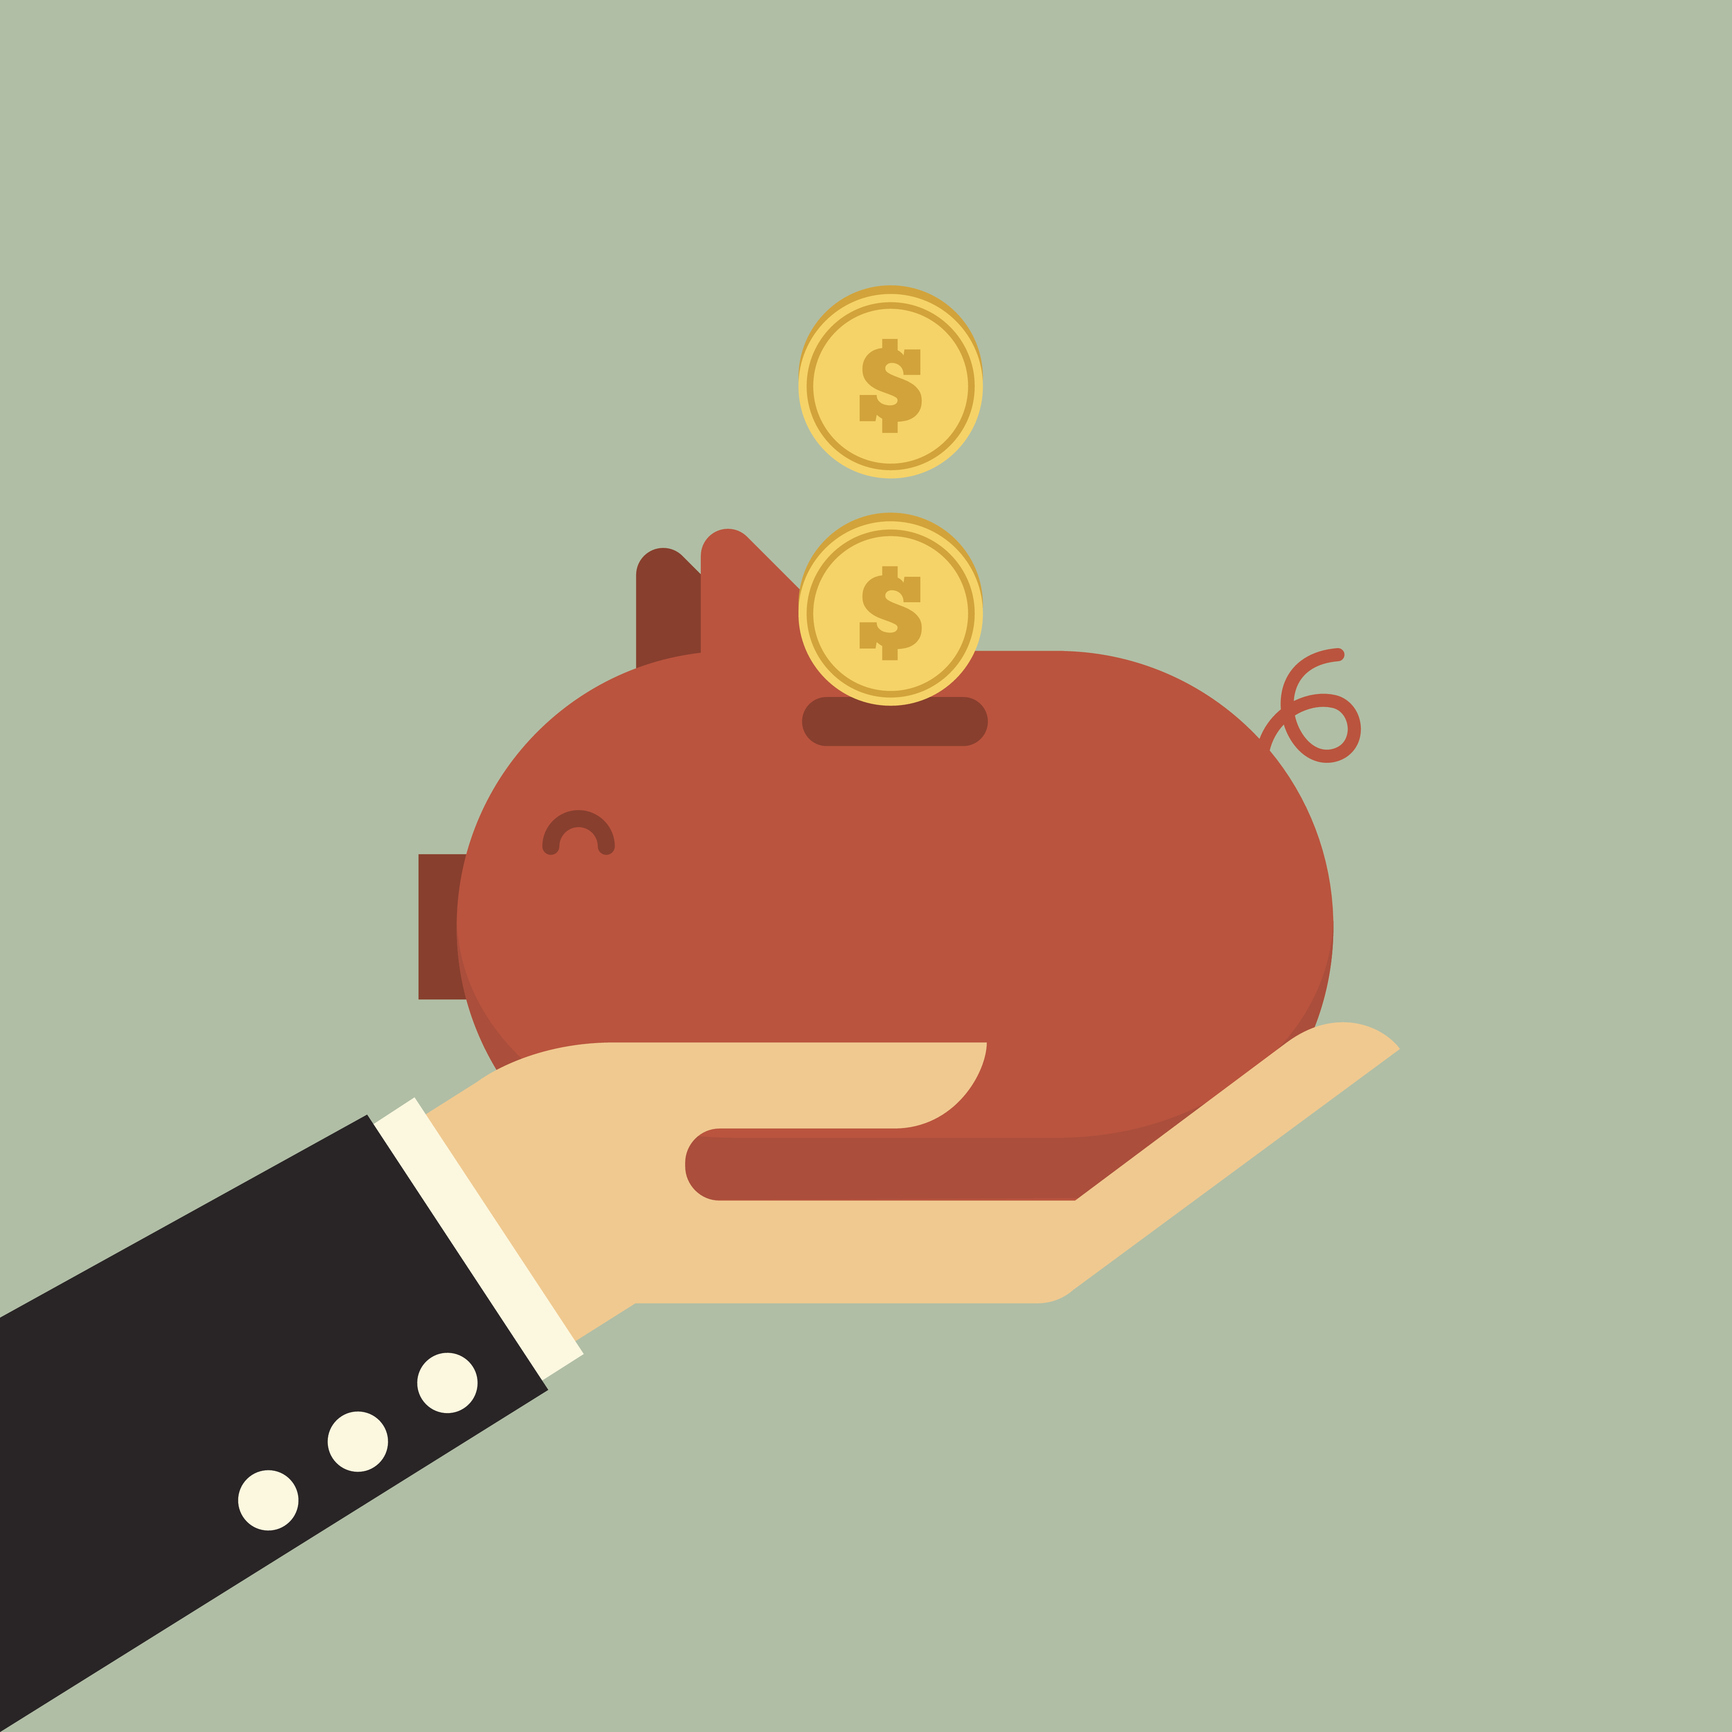 piggy bank on business hand .Saving